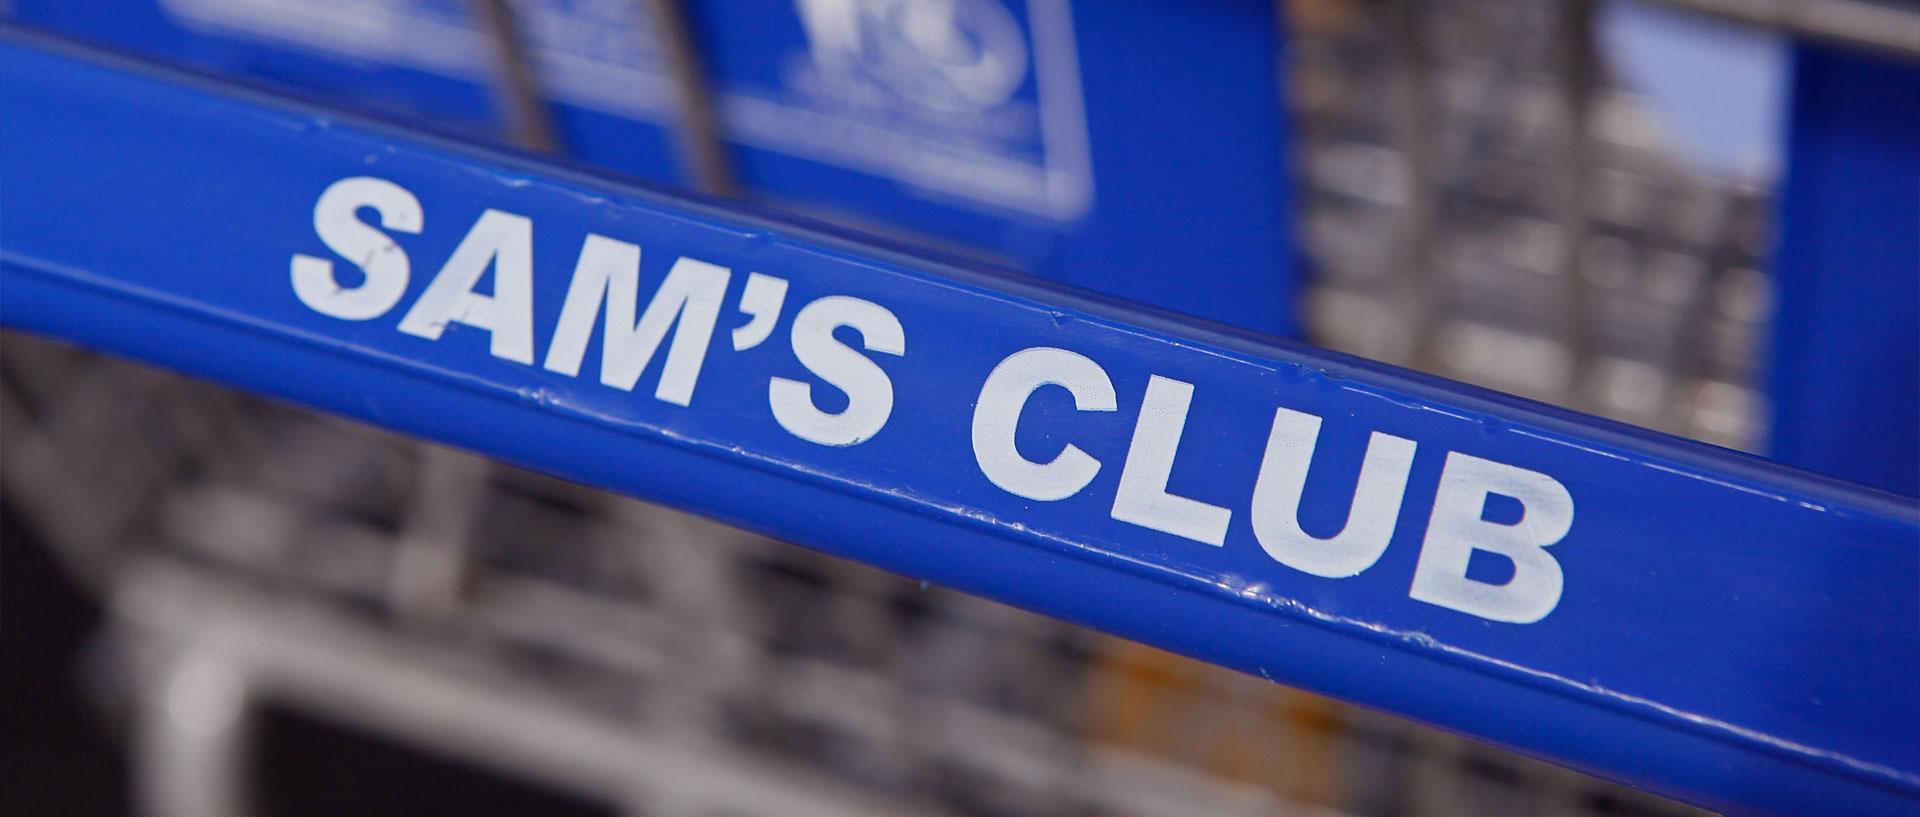 781 Sam's Club Consumer Reviews and Complaints